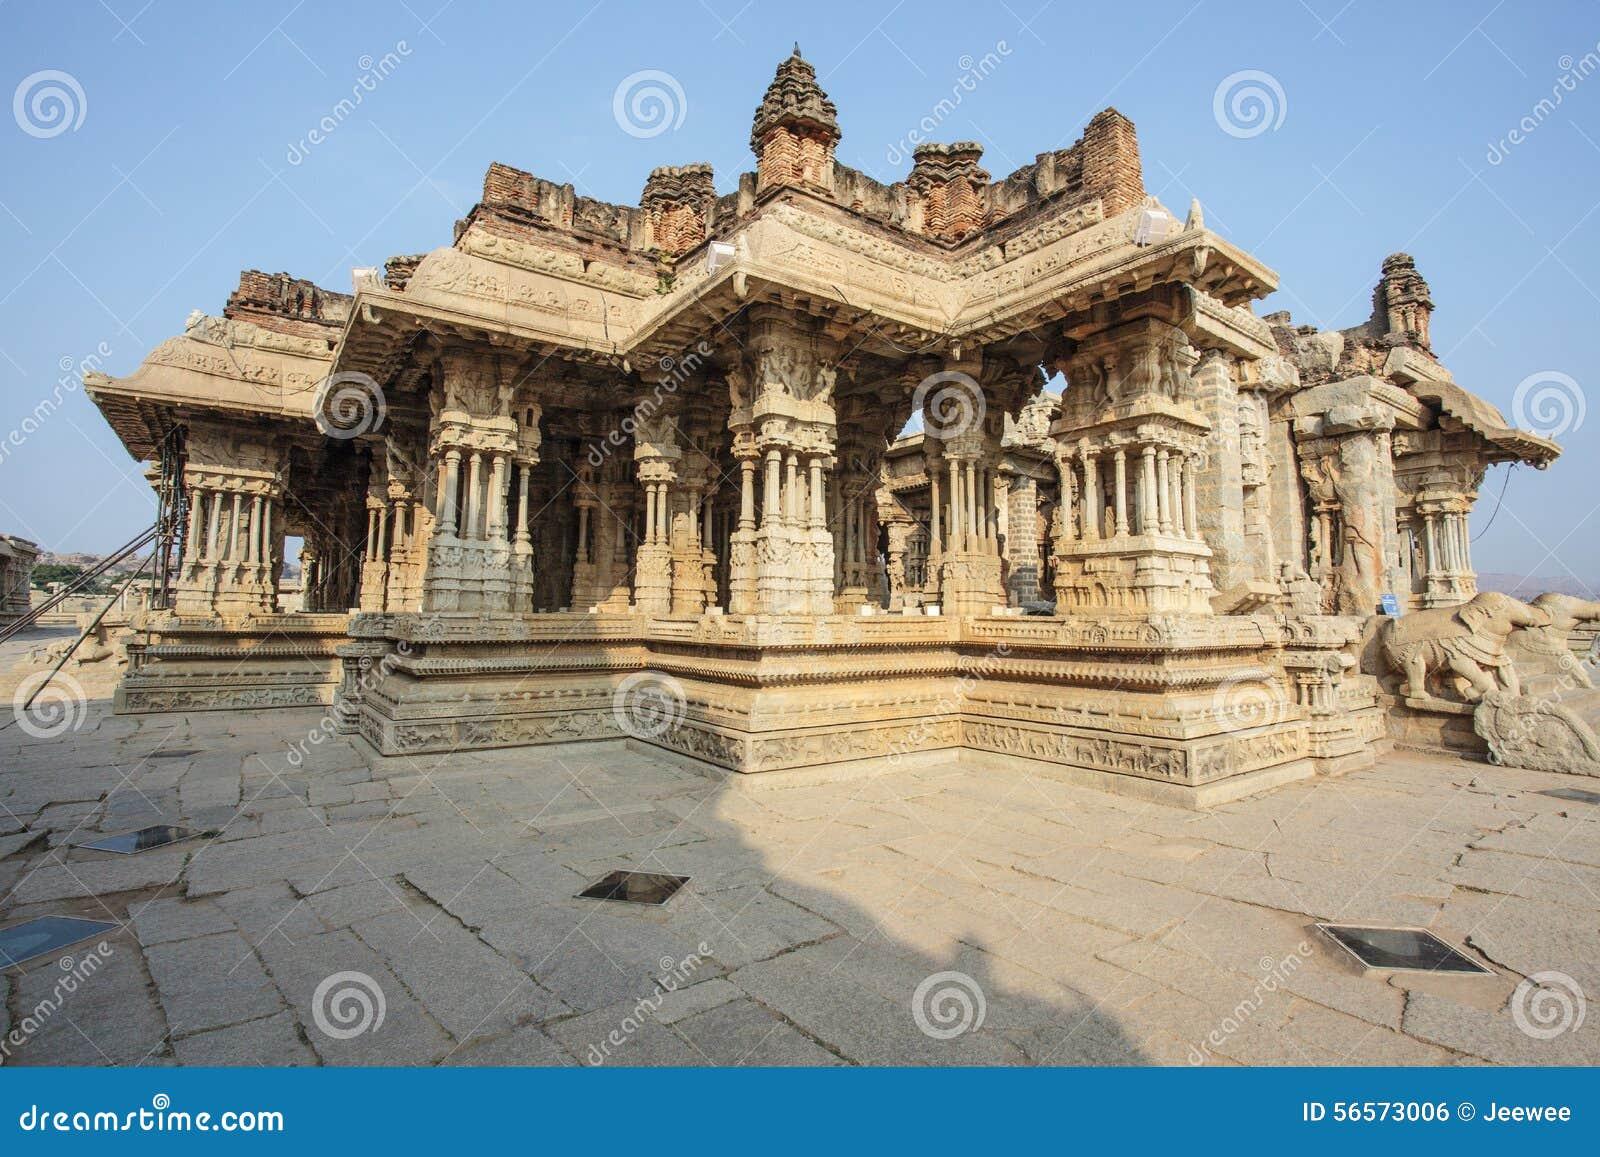 Download Μέσα στον ινδό ναό Vittala στην αρχαία περιοχή Hampi, Karnataka, Ινδία Στοκ Εικόνες - εικόνα από ασία, ανατολή: 56573006